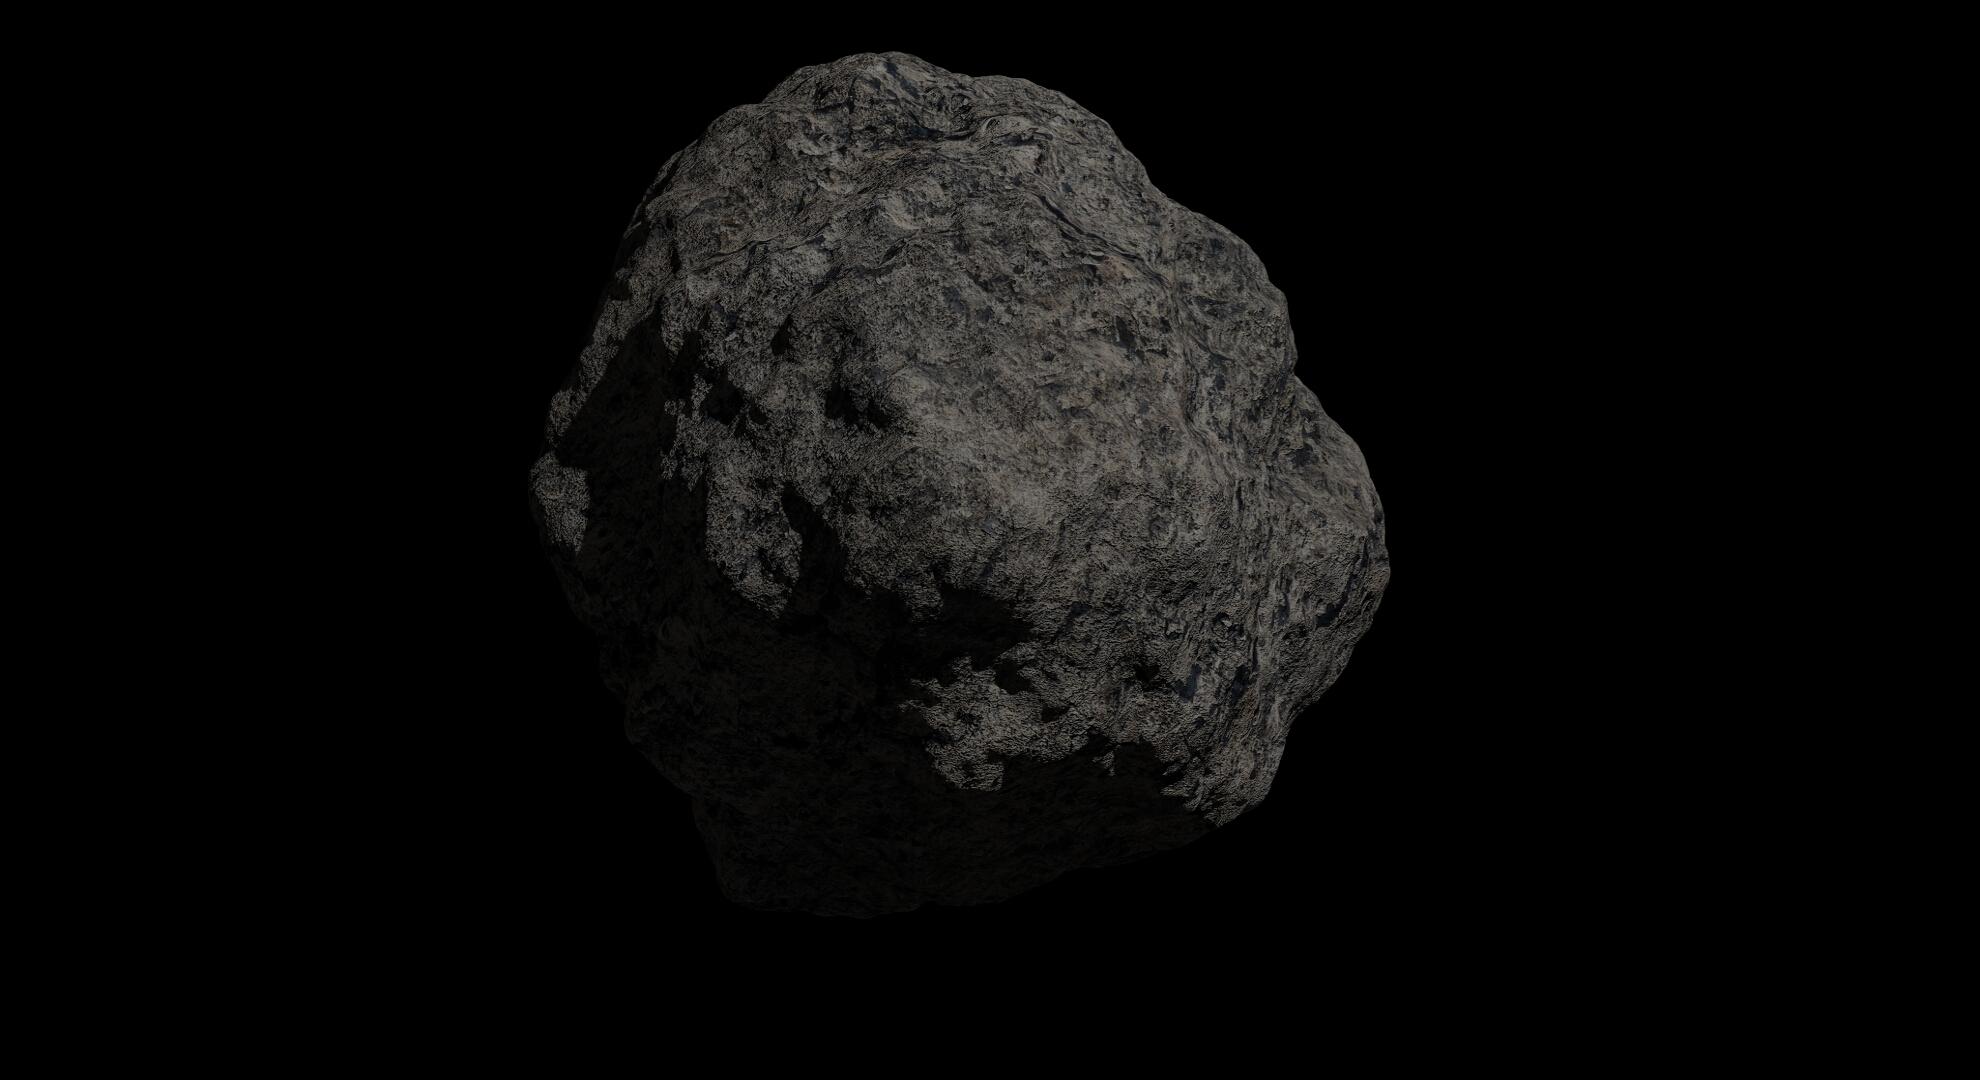 fantasy asteroid 2 3d model 3ds blend dae fbx obj 267199